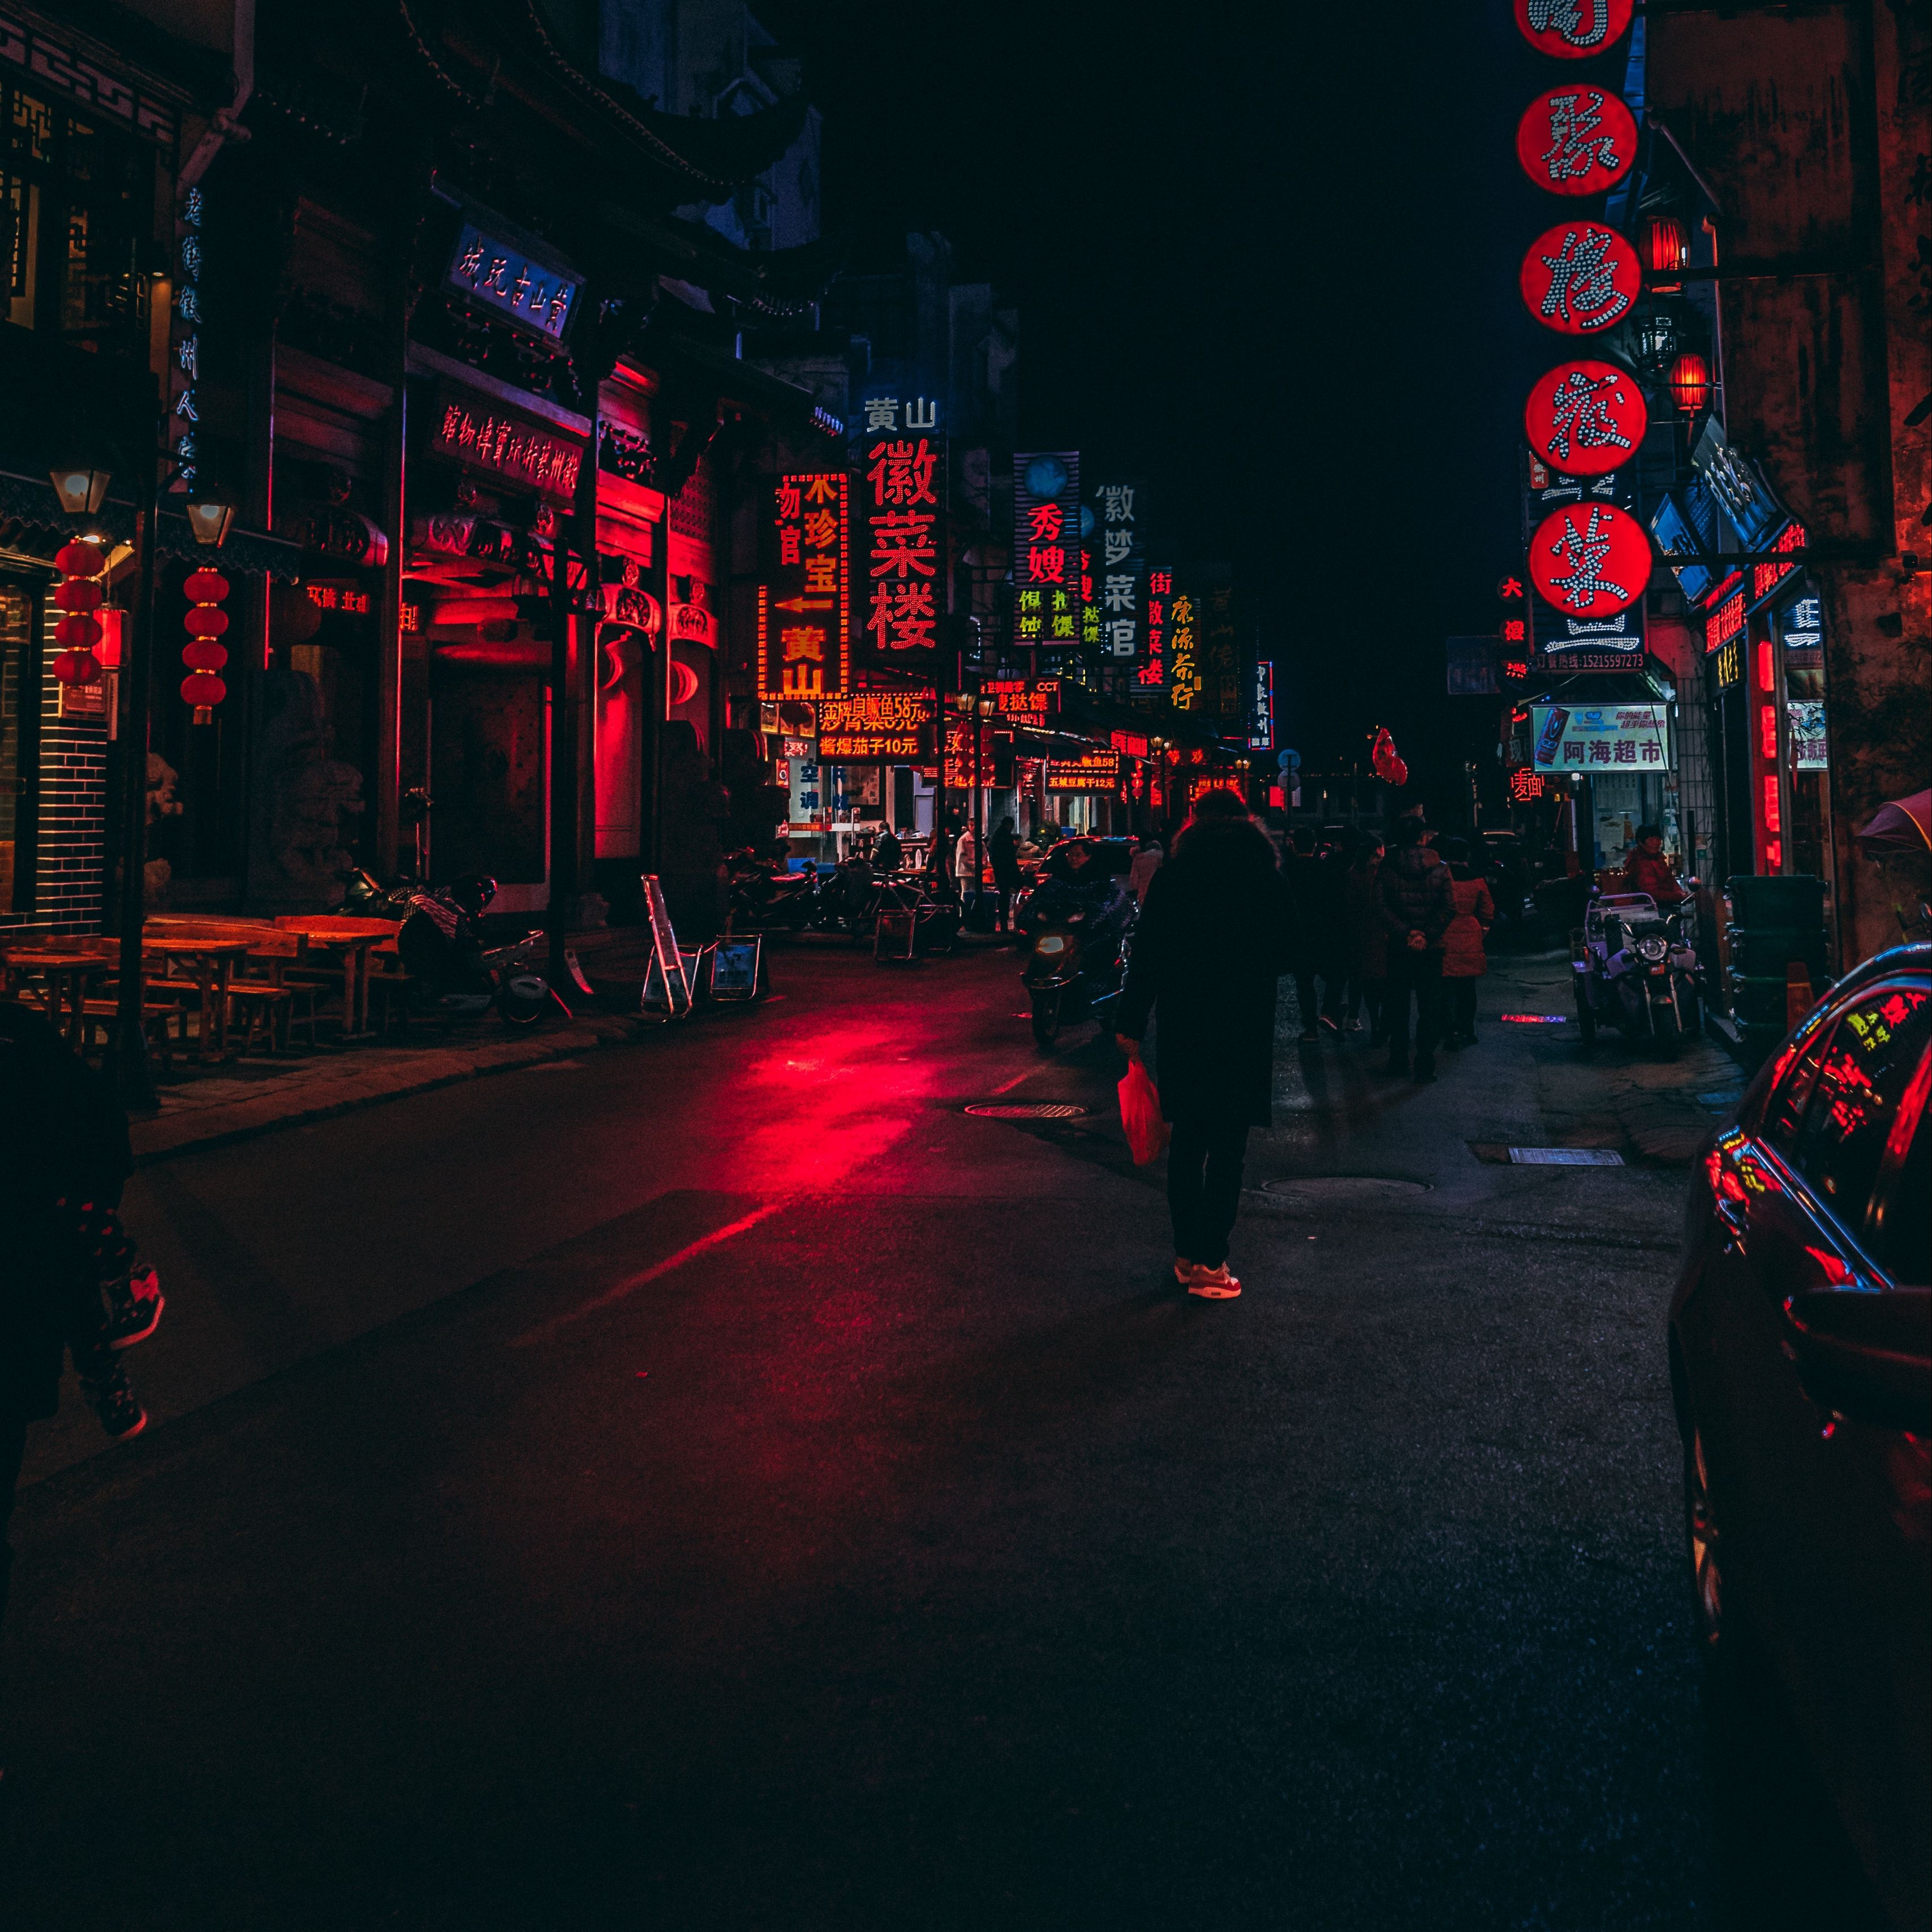 Download Wallpaper 3415x3415 Street Lighting Lights Signs City